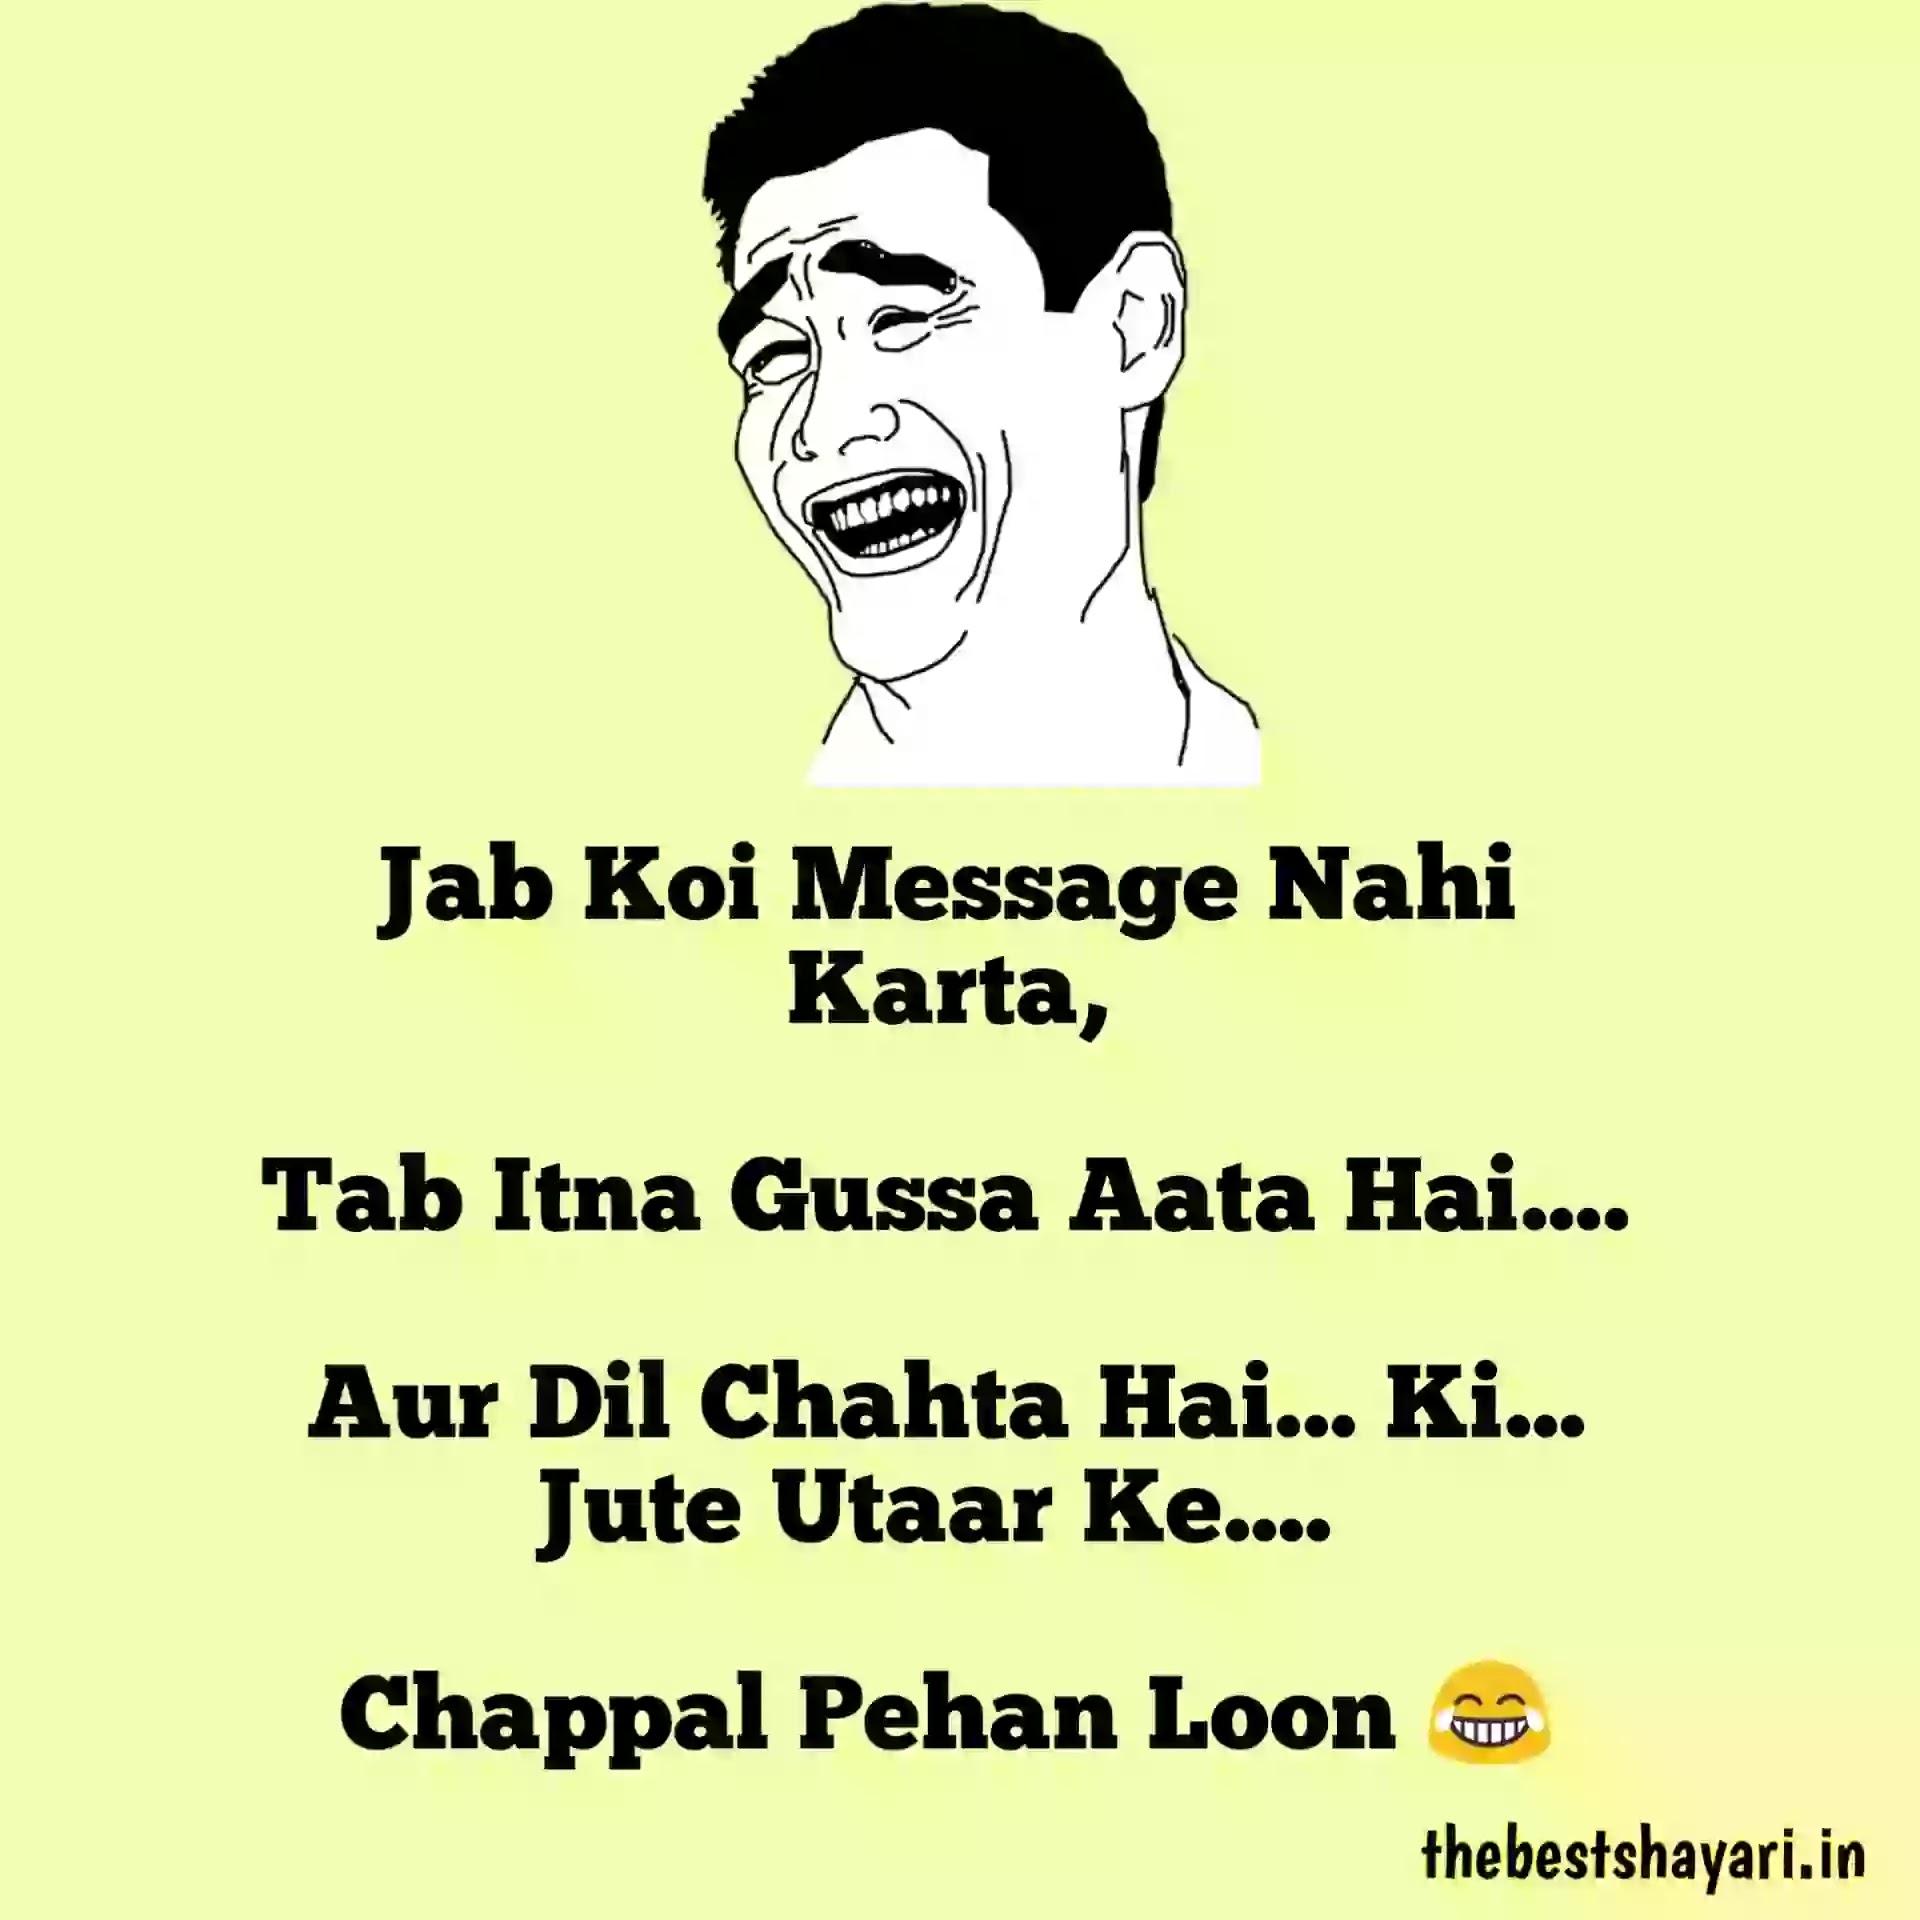 Hindi comedy jokes image